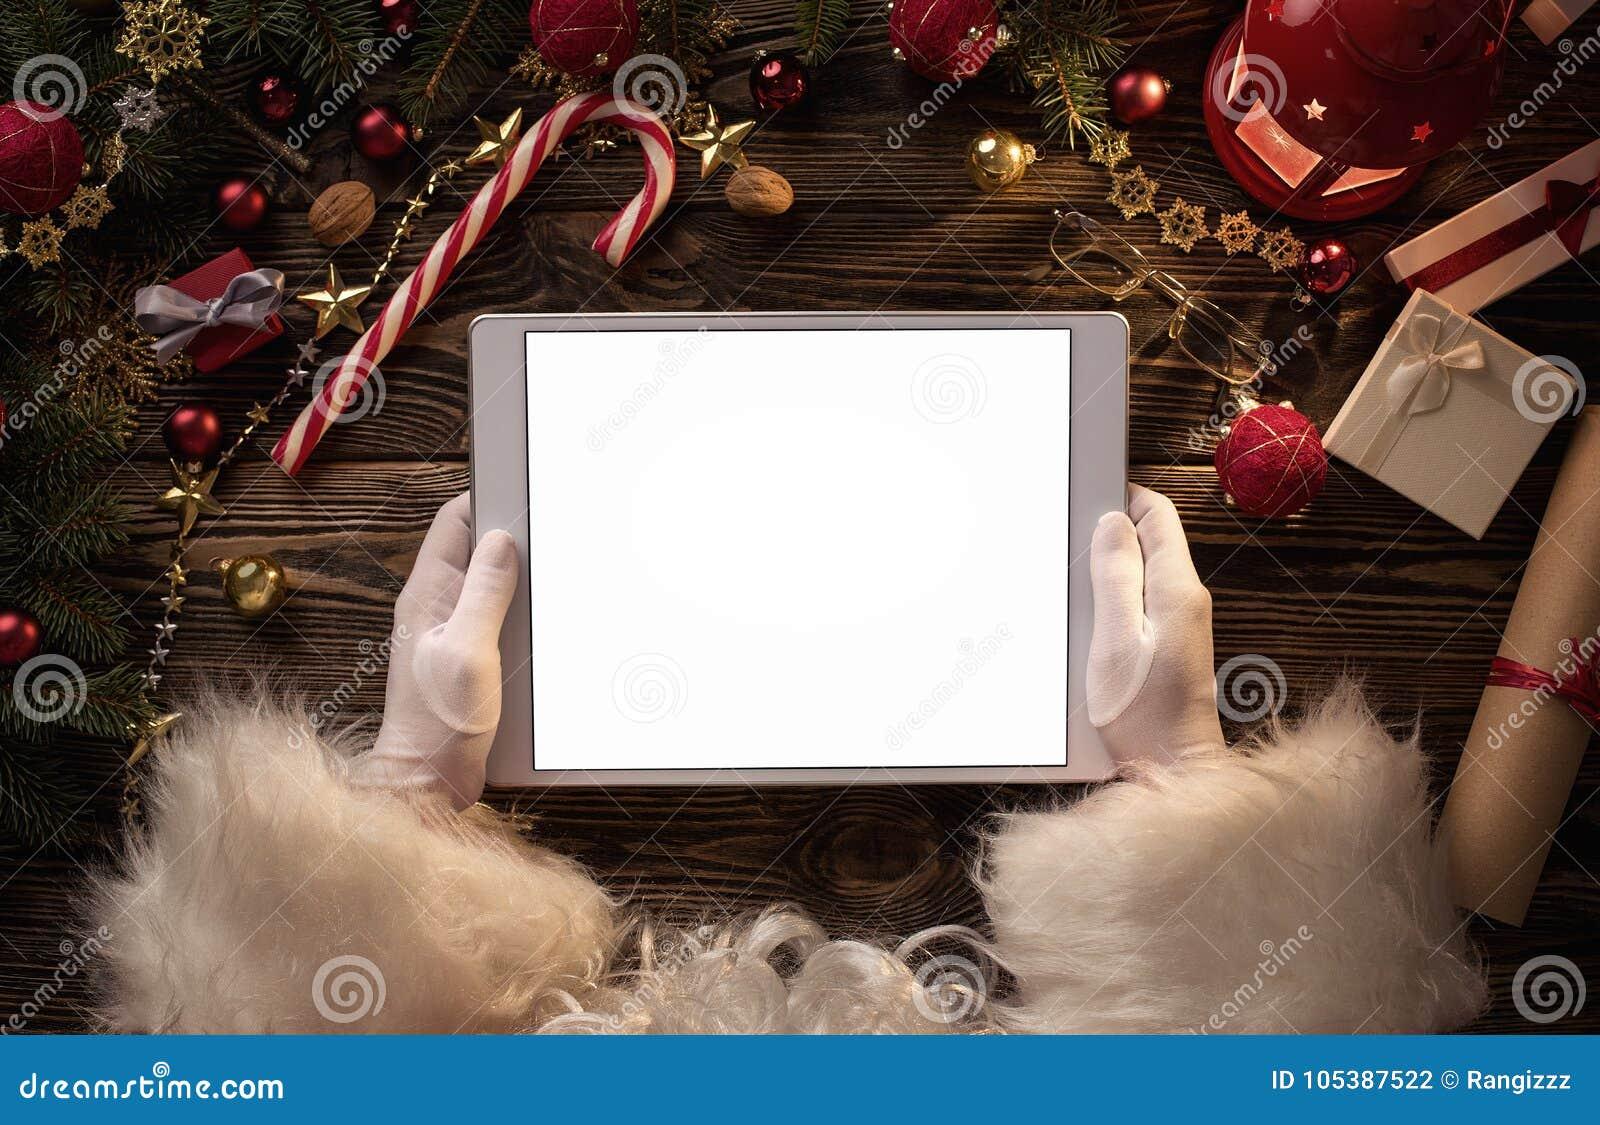 Mãos de Santa Claus que guardam a tabuleta digital vazia